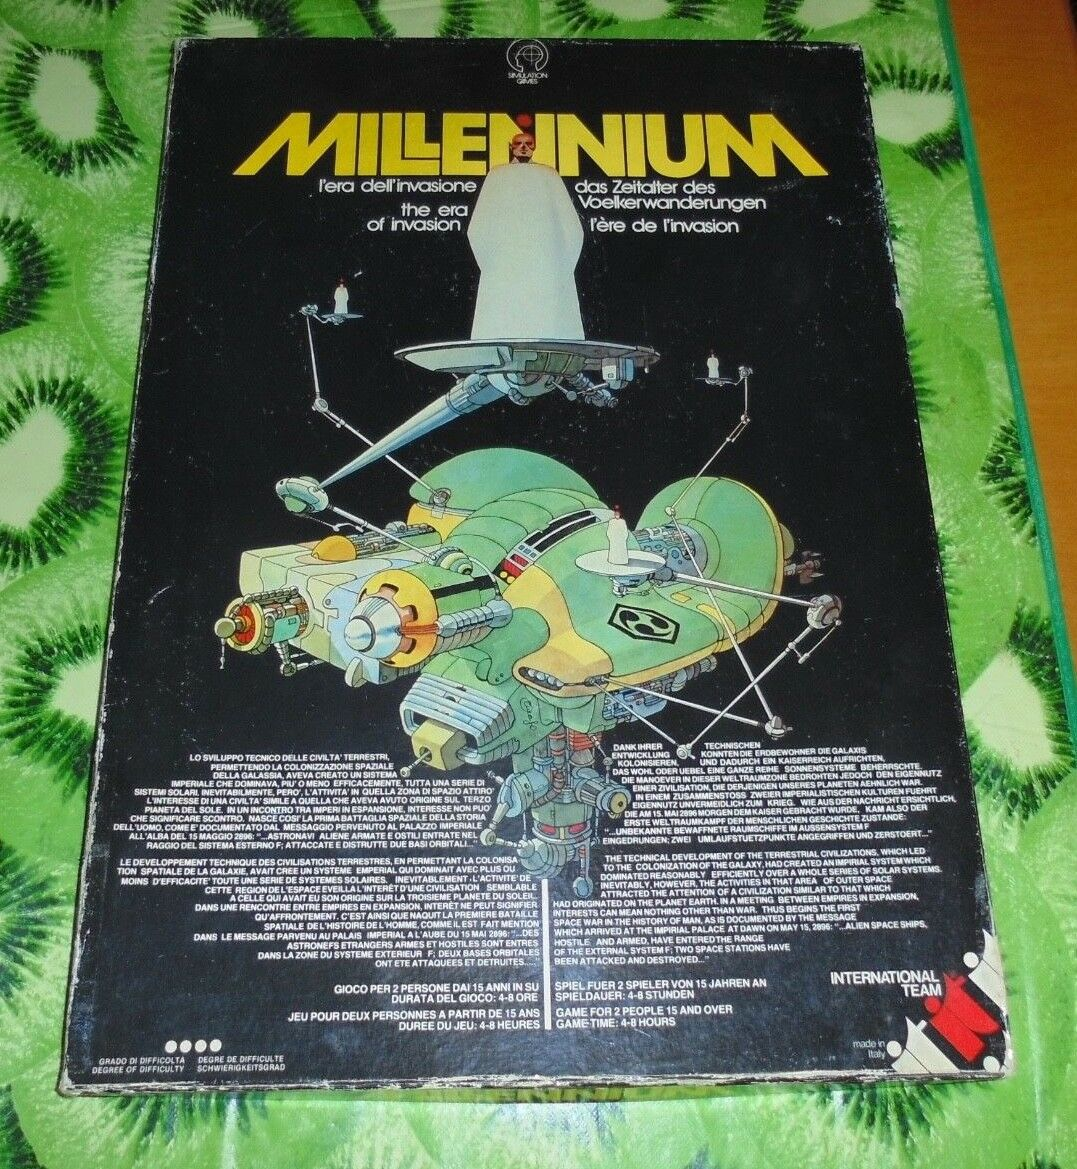 Millennium simulation games International games gioco tavolo simulazione vintage